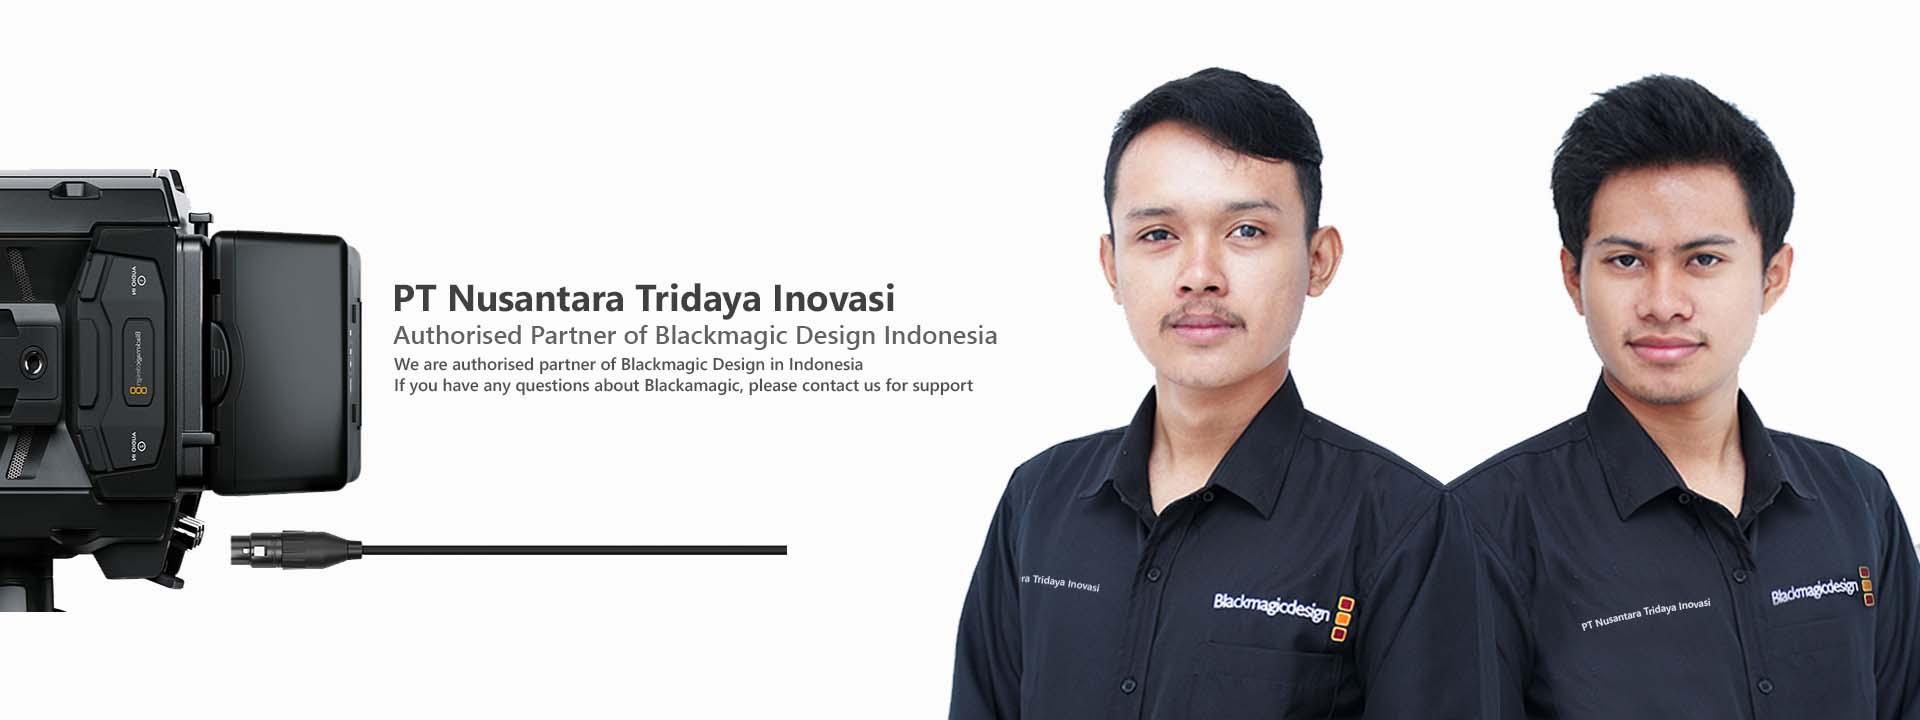 Blackmagic Design Pt Nusantara Tridaya Inovasi